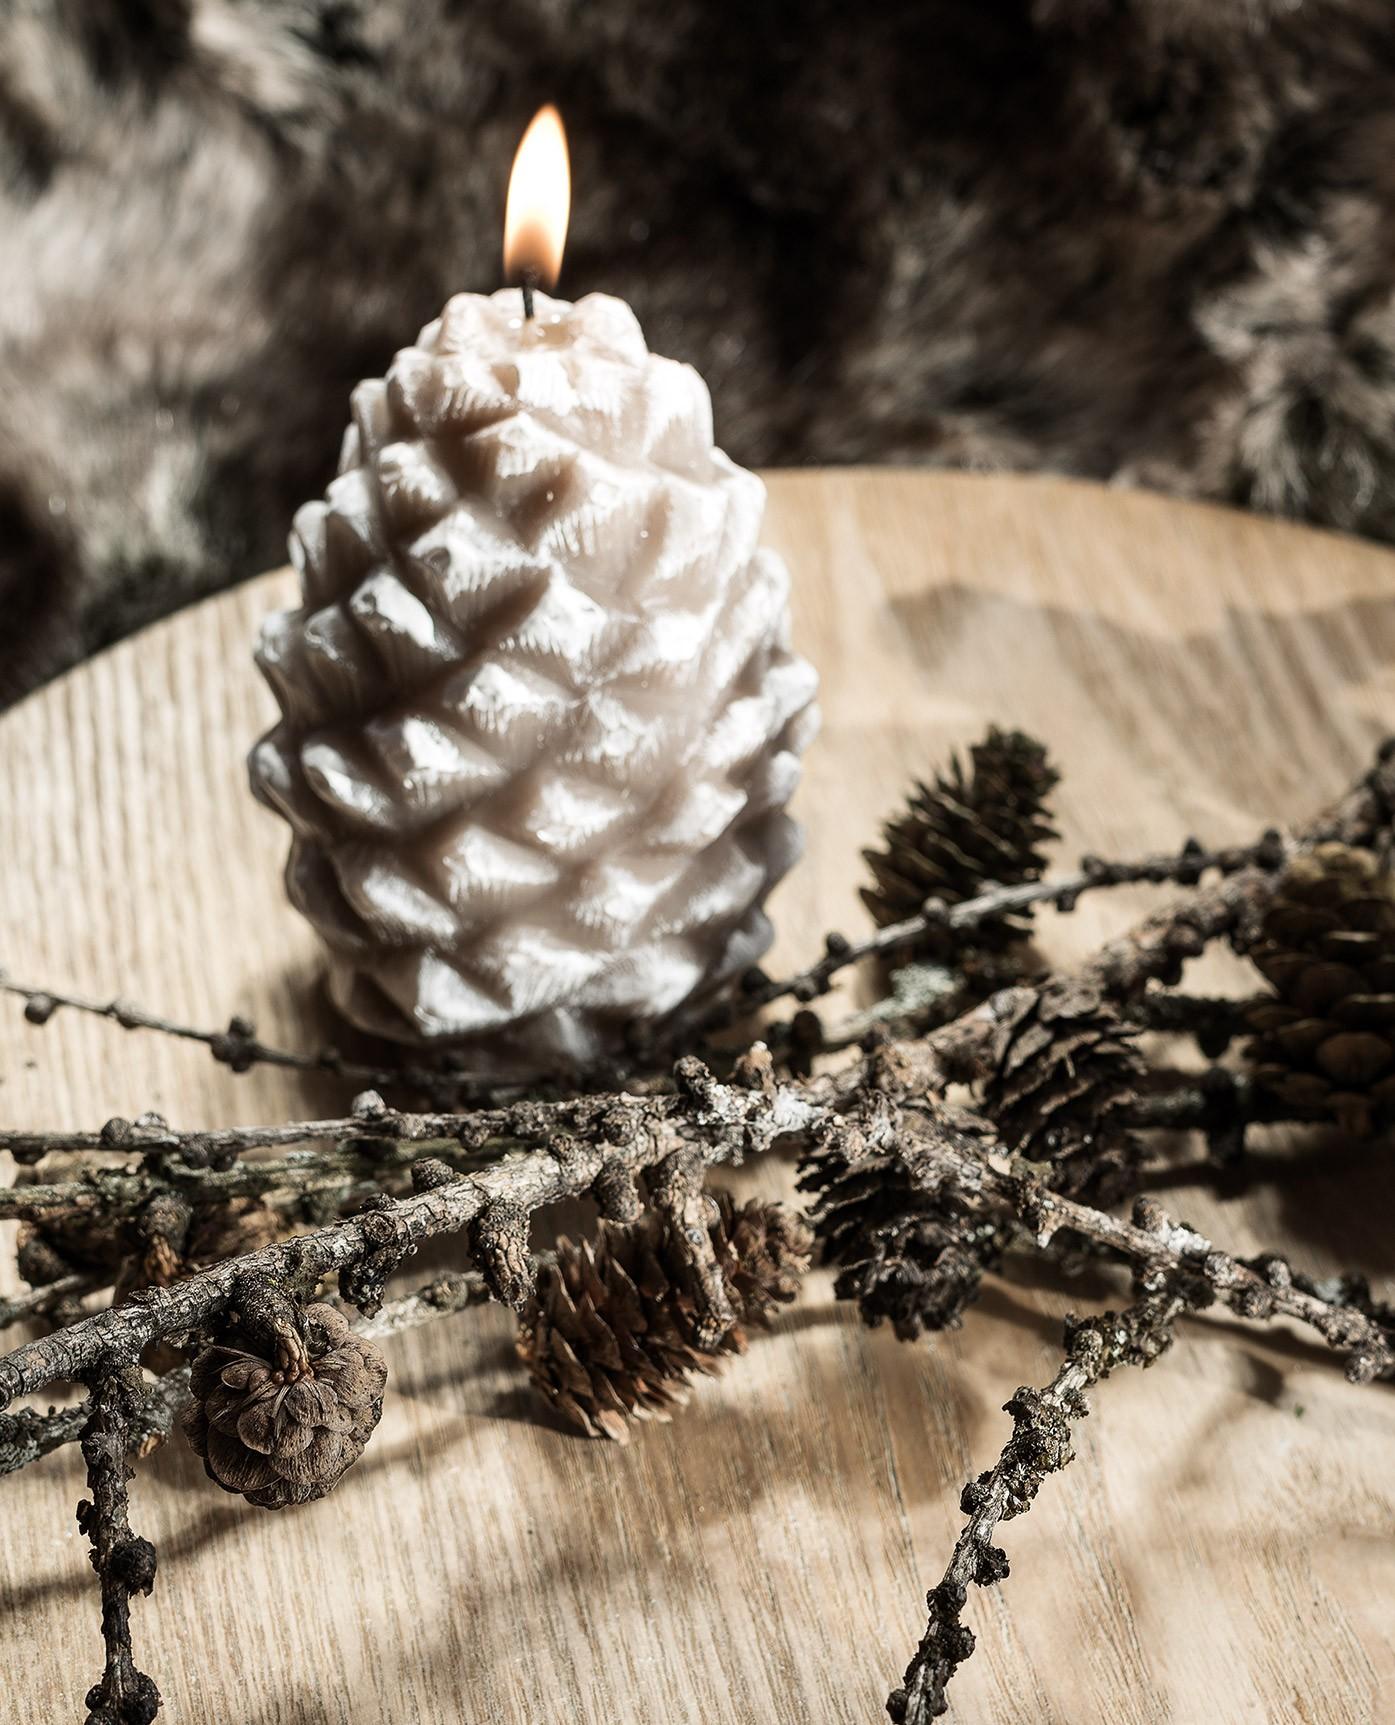 bougie-decorative-patinee-pomme-de-pin-105cm-beige